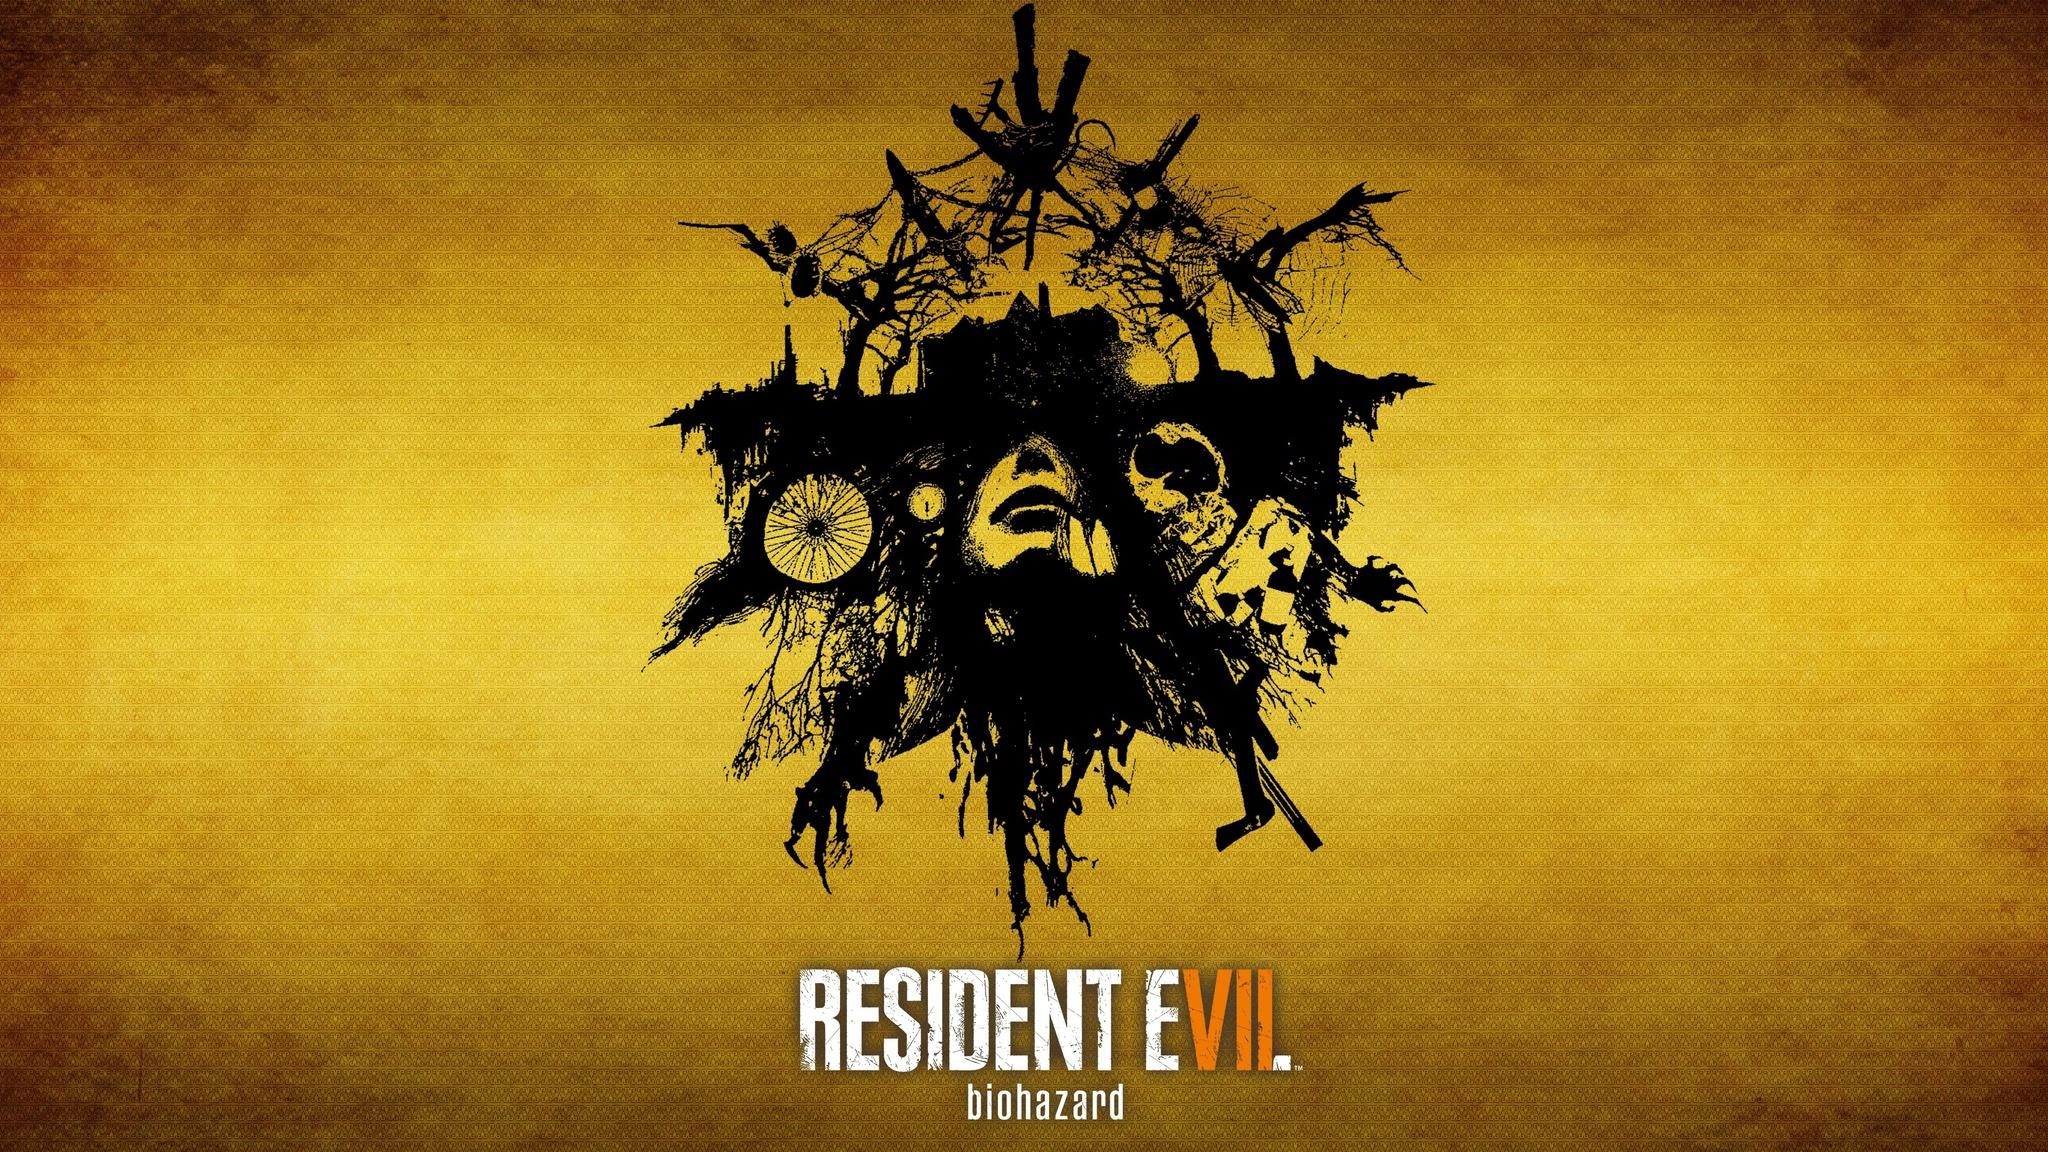 Resident Evil 7 Hd Wallpaper: 2048x1152 Resident Evil 7 Biohazard 2048x1152 Resolution